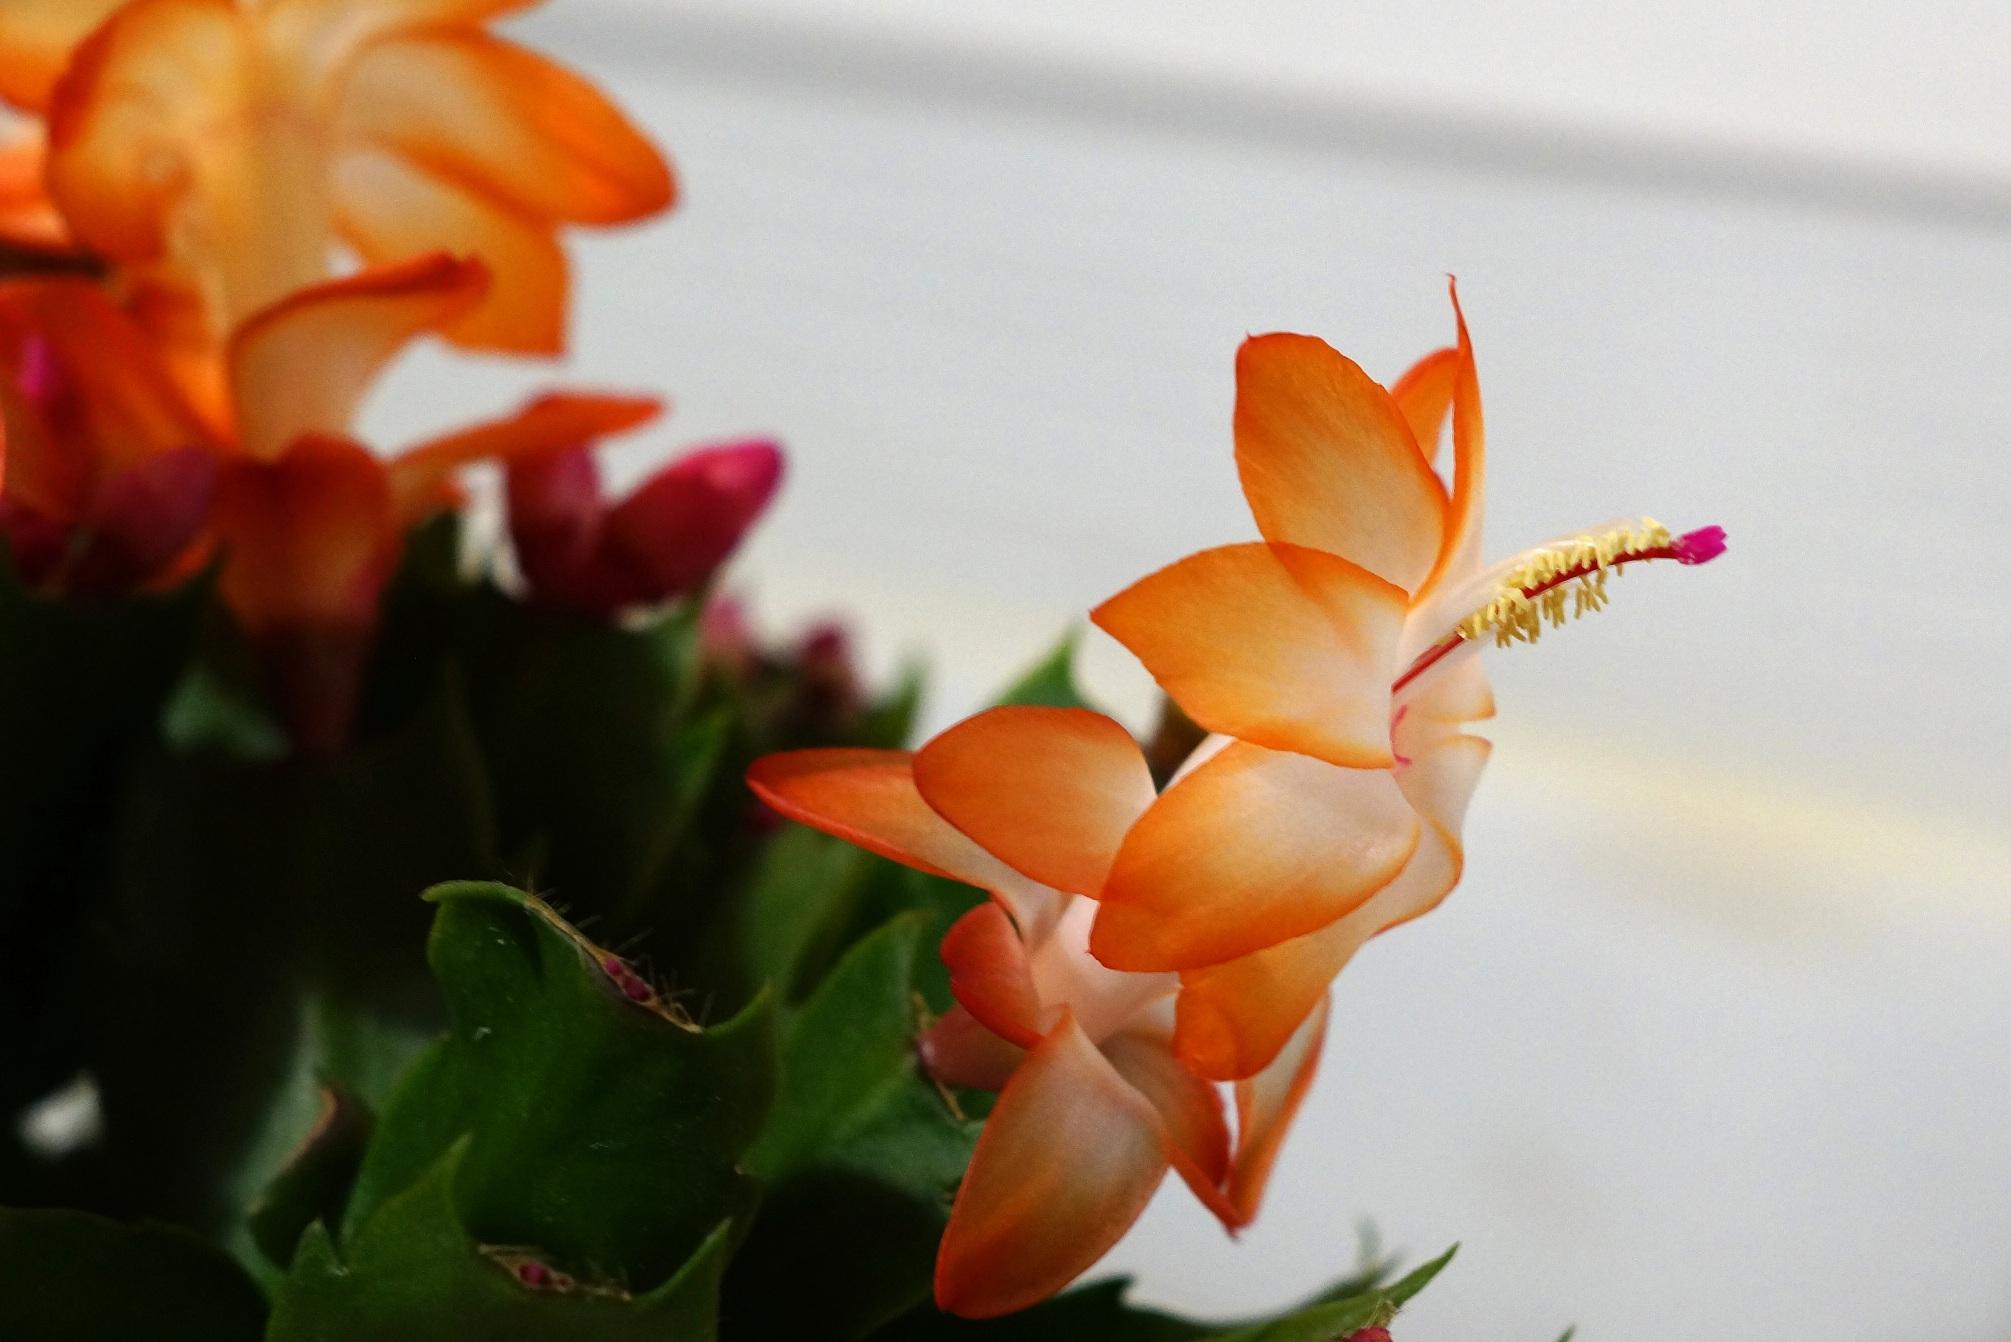 Schlumbergera, Zygocactus, Epiphyllum – szlumbergera, kaktus bożonarodzeniowy, grudnik